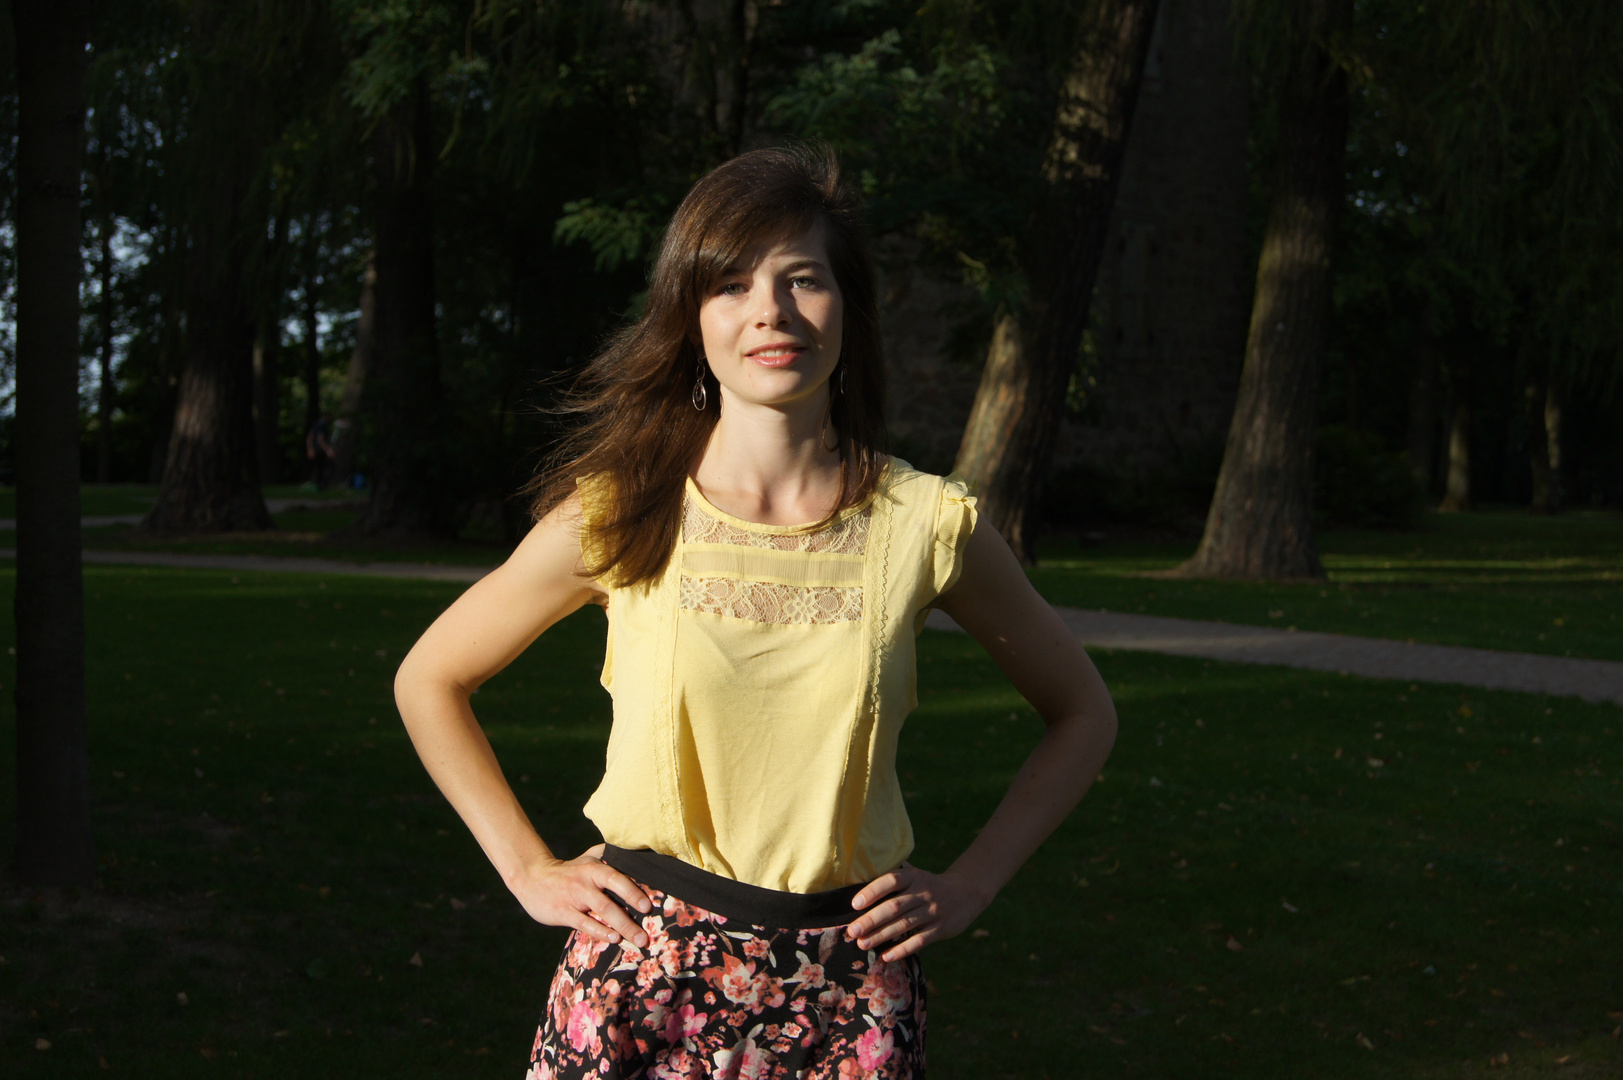 Ines im Park II